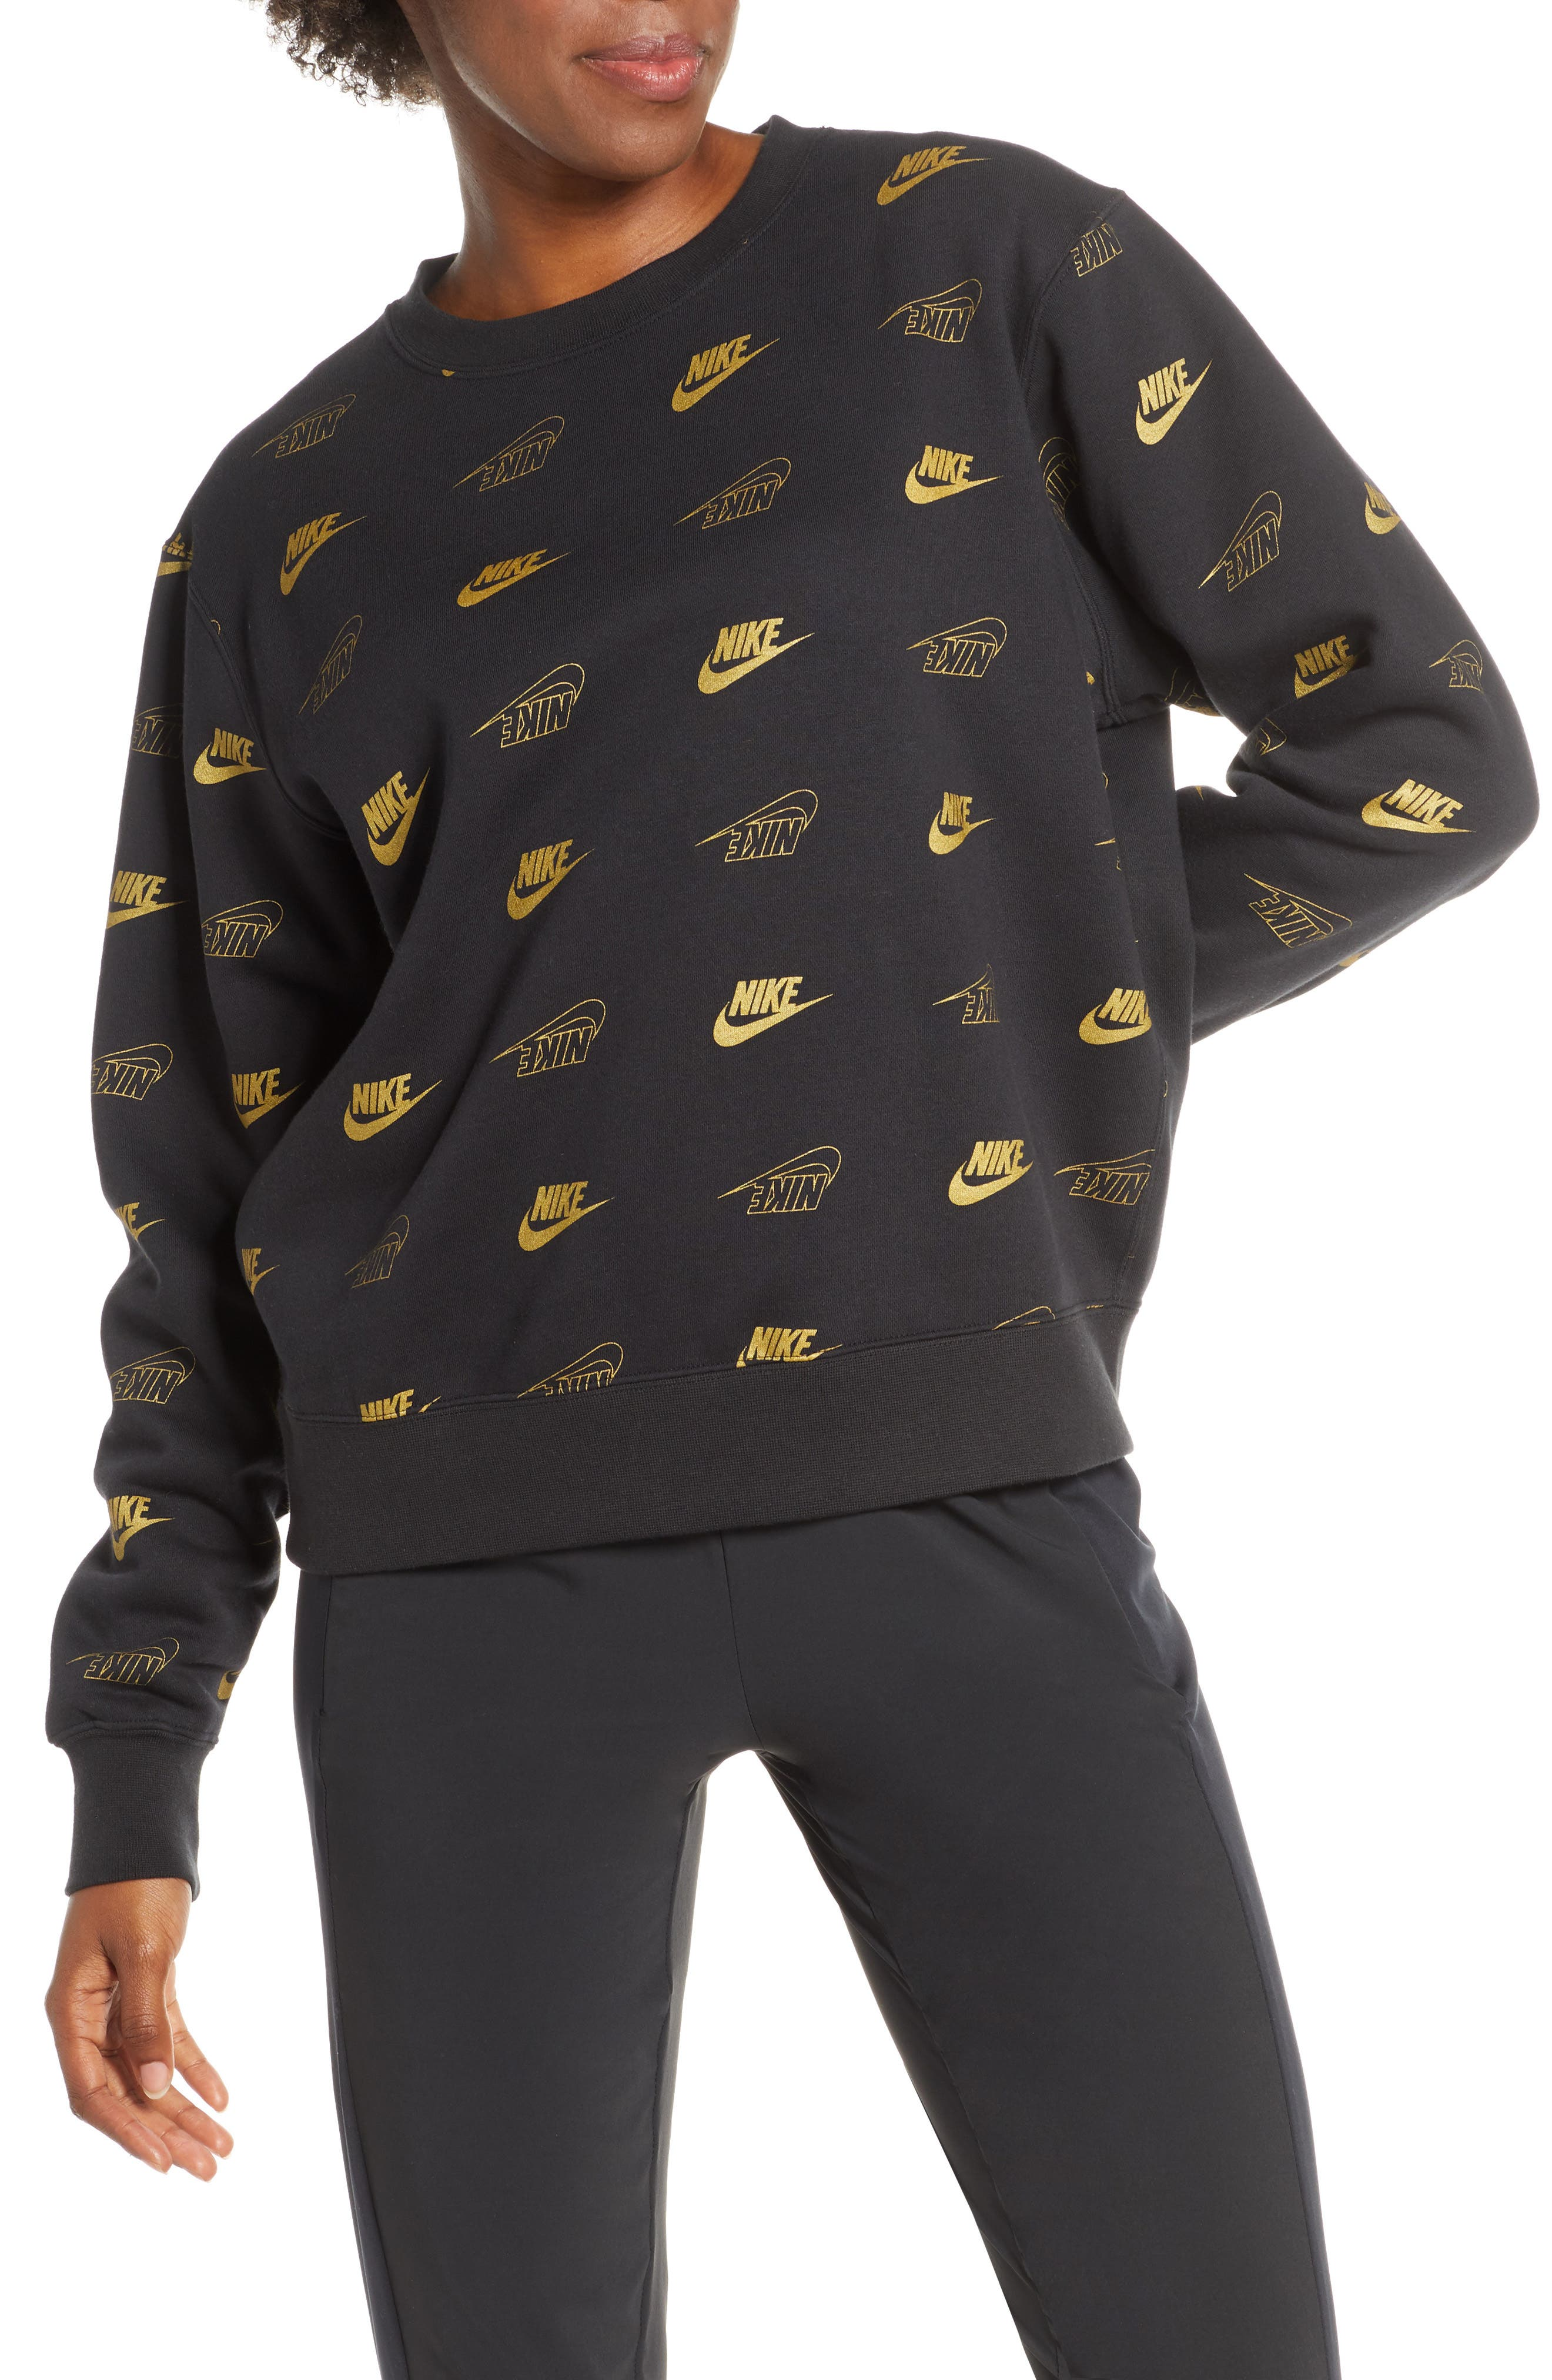 Nikew Sportswear Graphic Sweatshirt